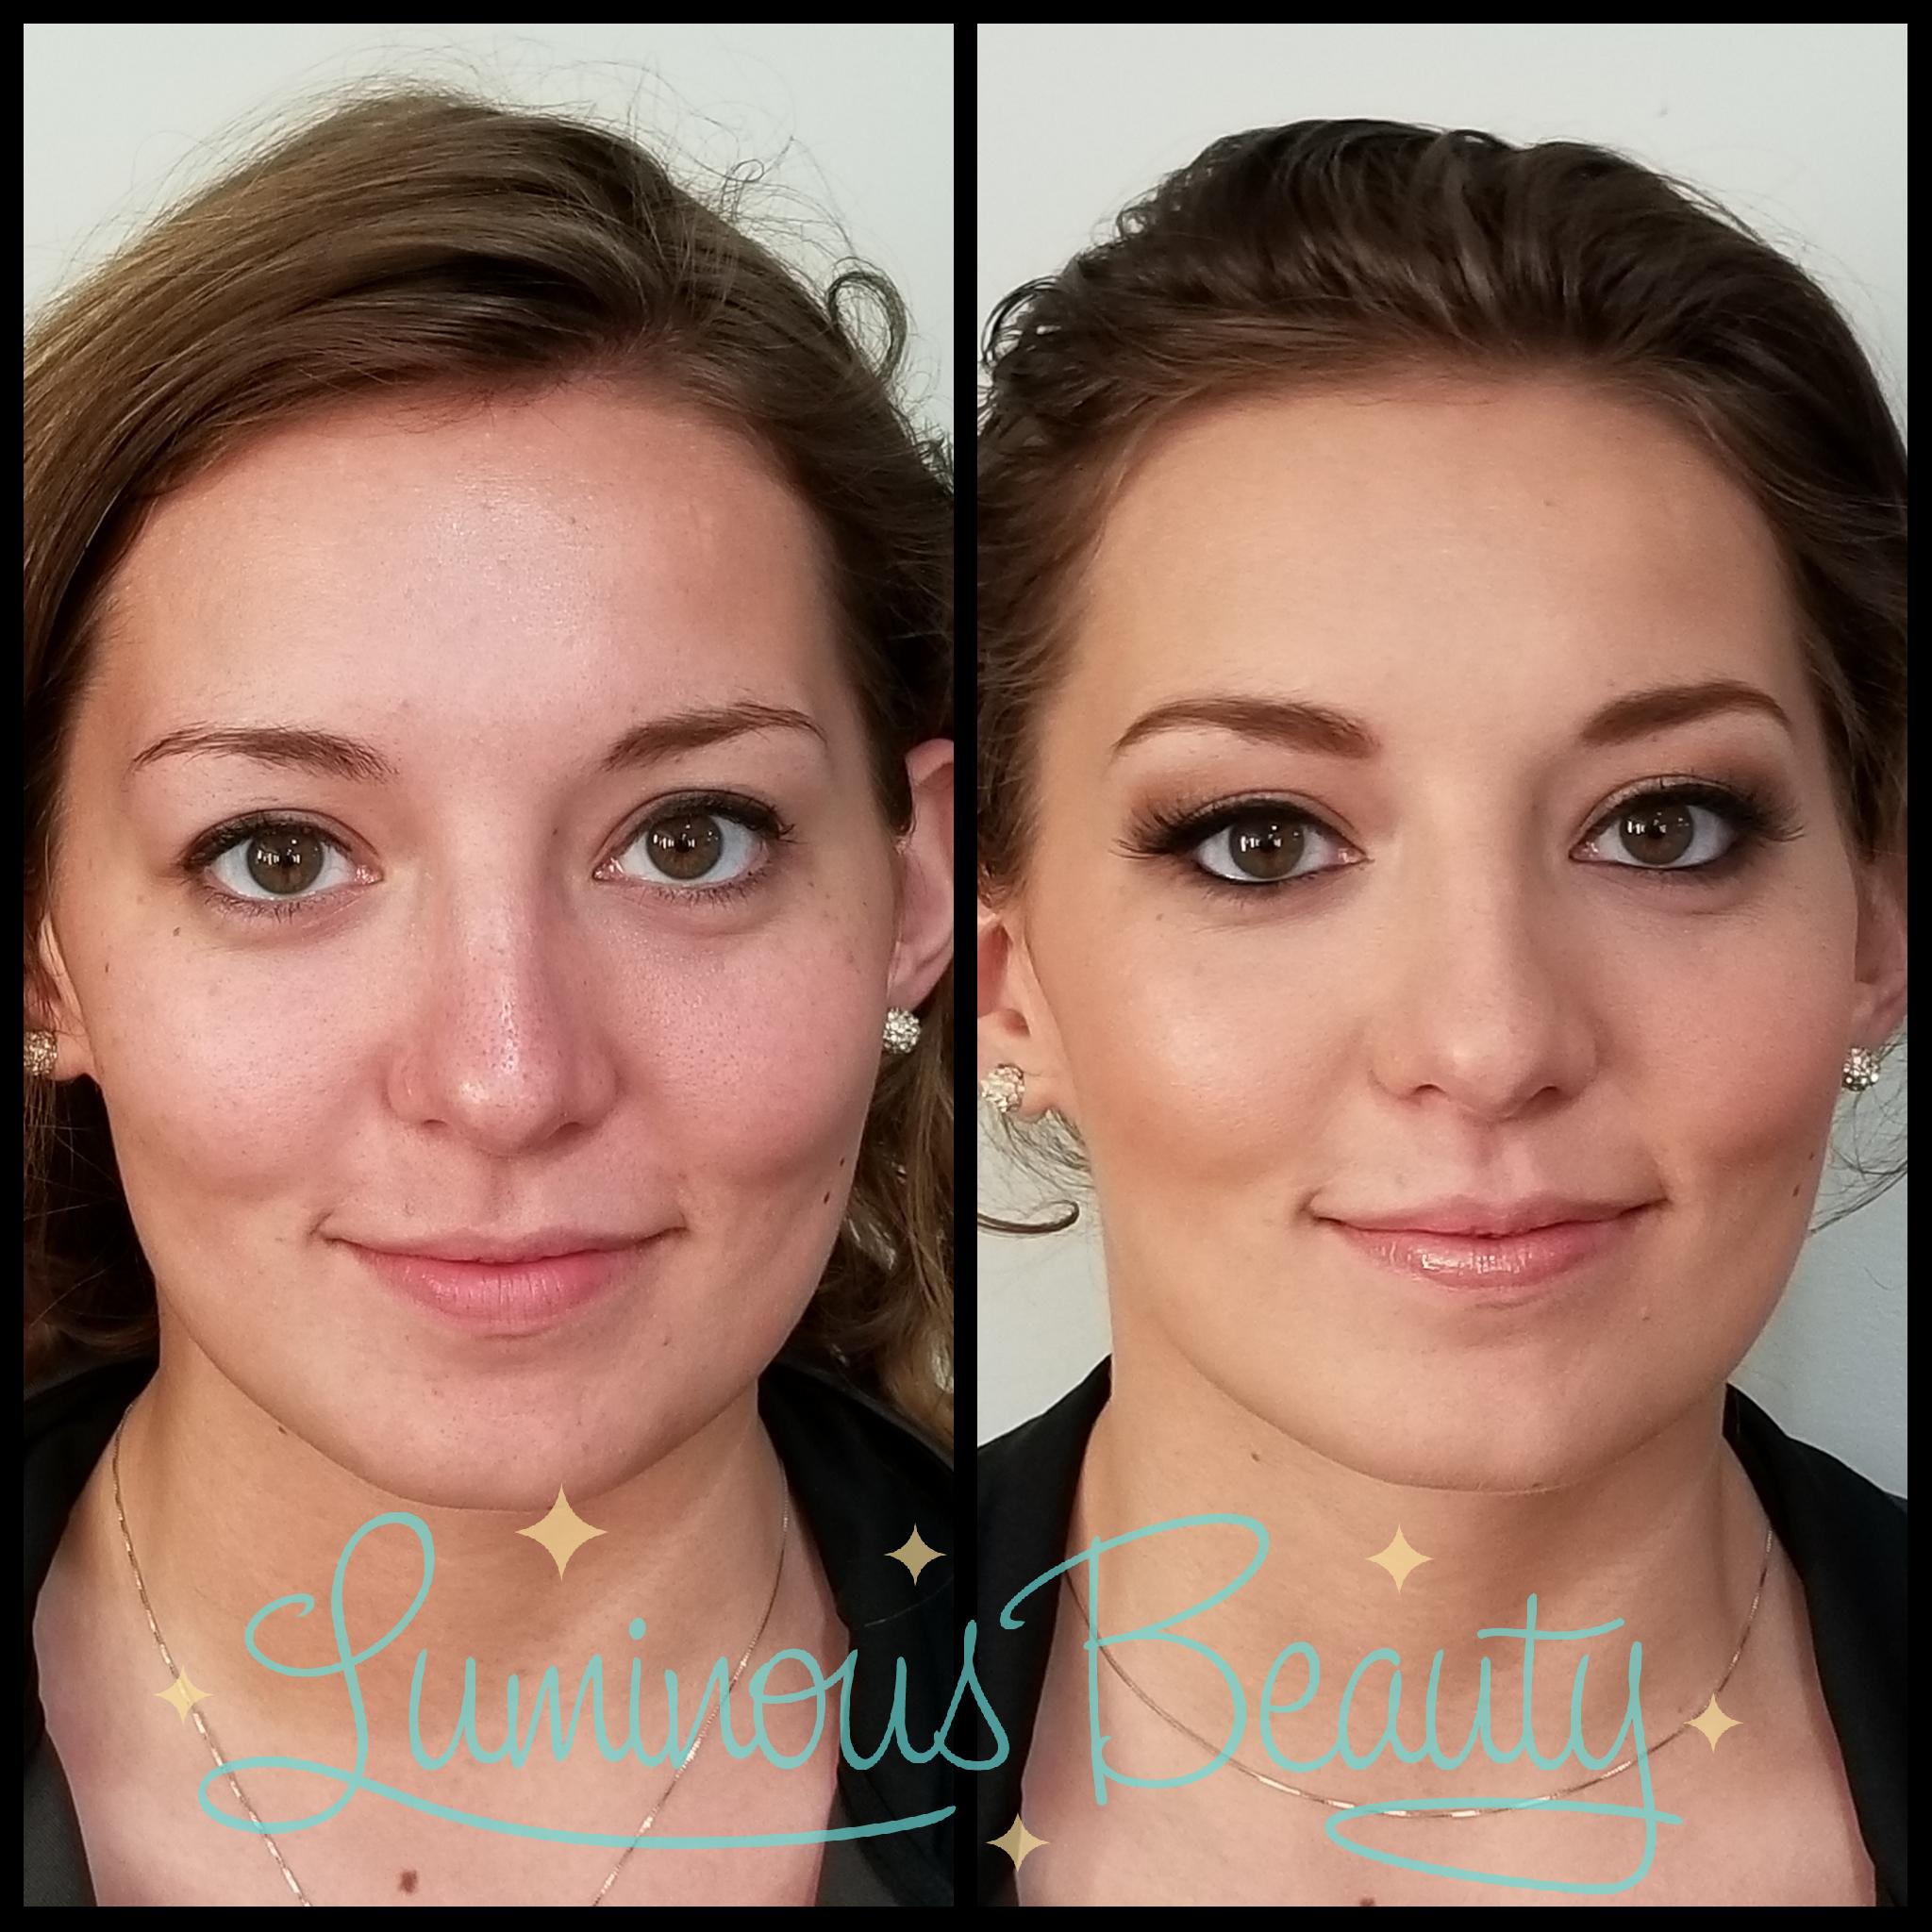 Bridesmaid Makeup. Airbrush. Golden Smokey Eye Makeup with False Lashes & Peachy Lip. Luminous Beauty Makeup Artist..png